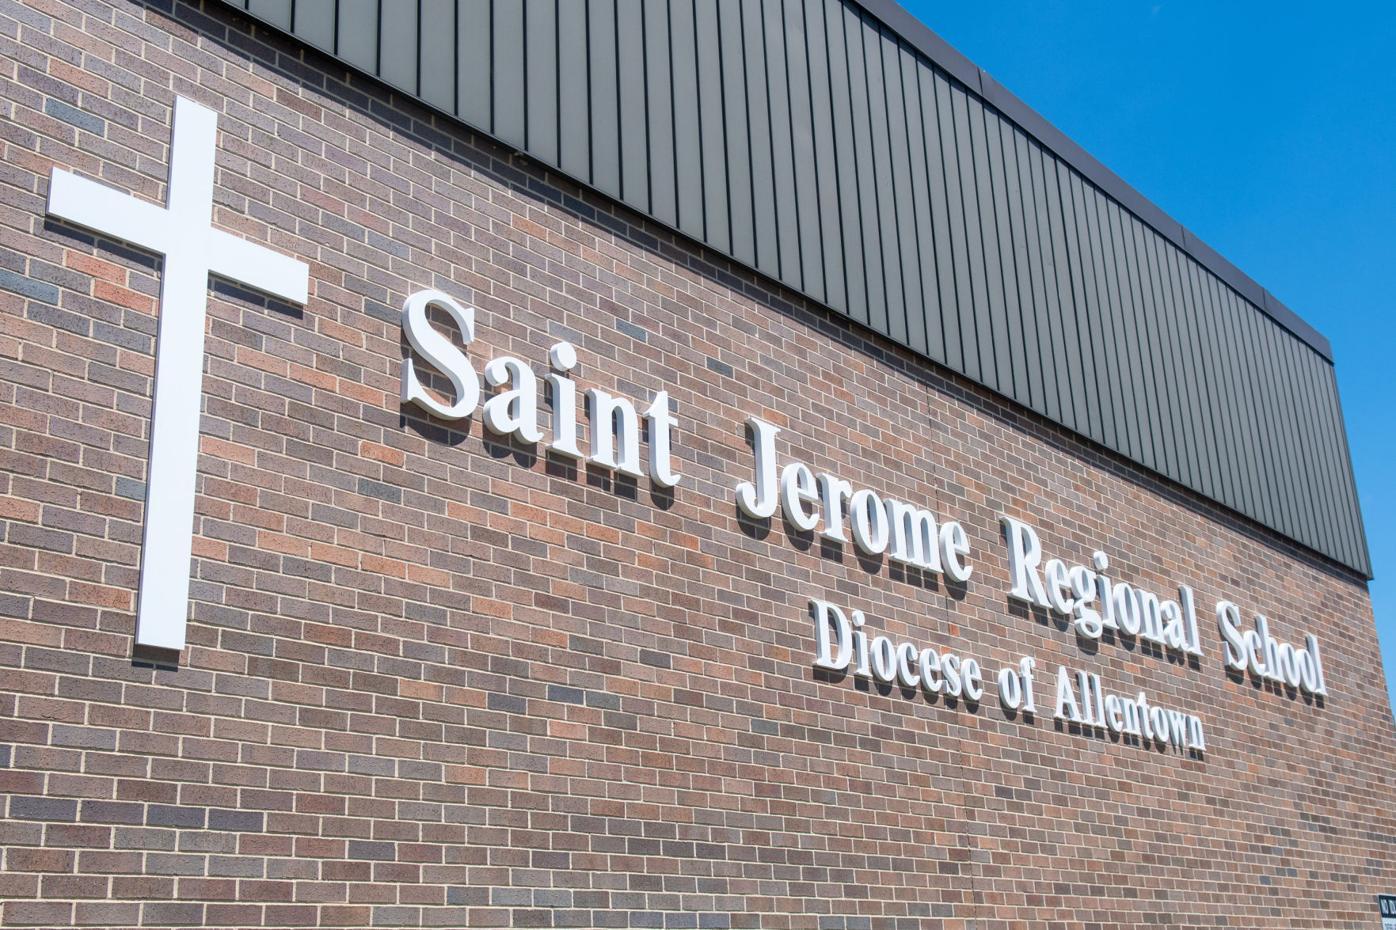 ST. JEROME SCHOOL